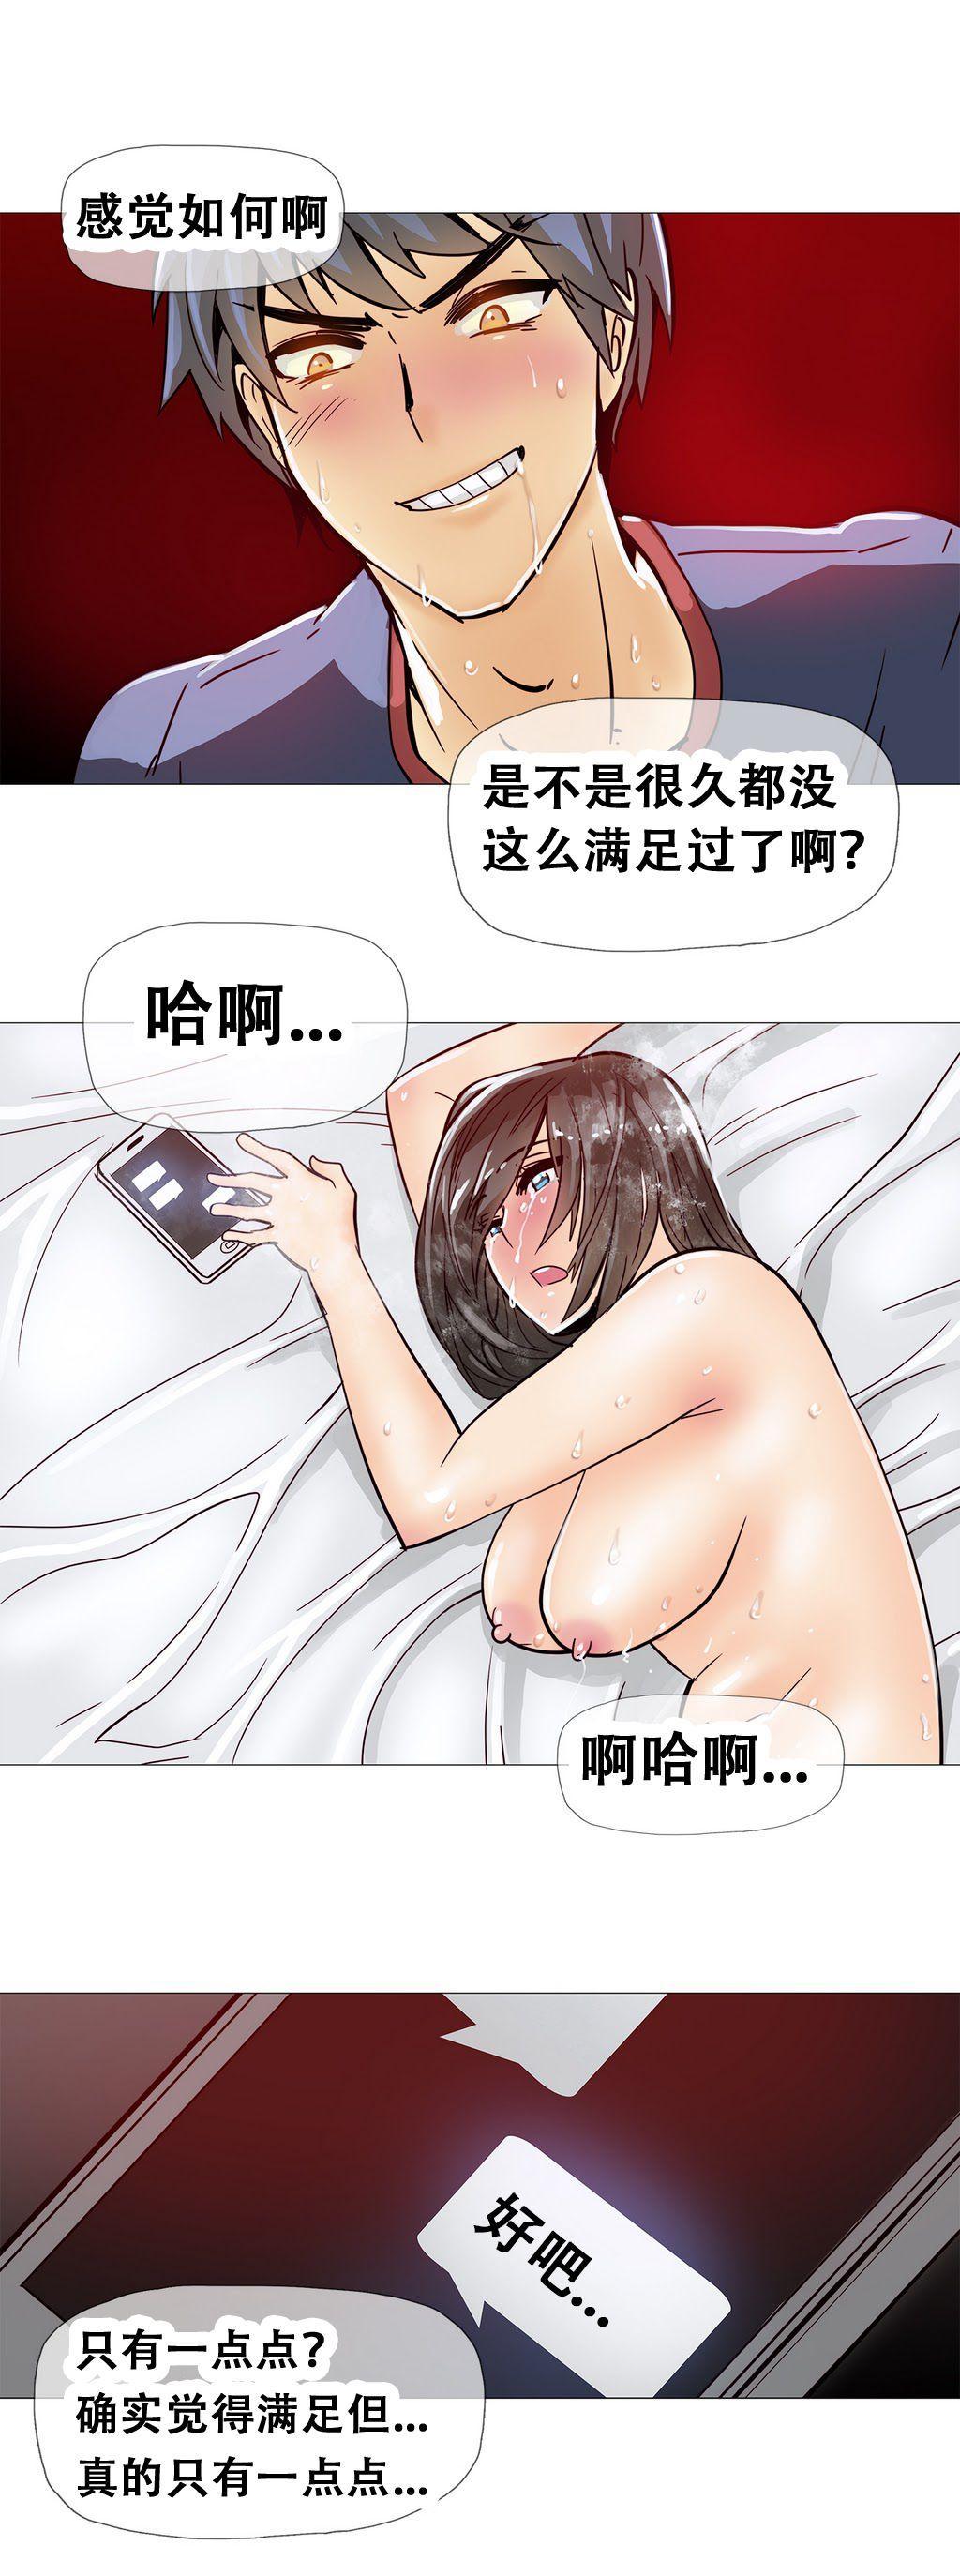 HouseHold Affairs 【卞赤鲤汉化】1~15话 271